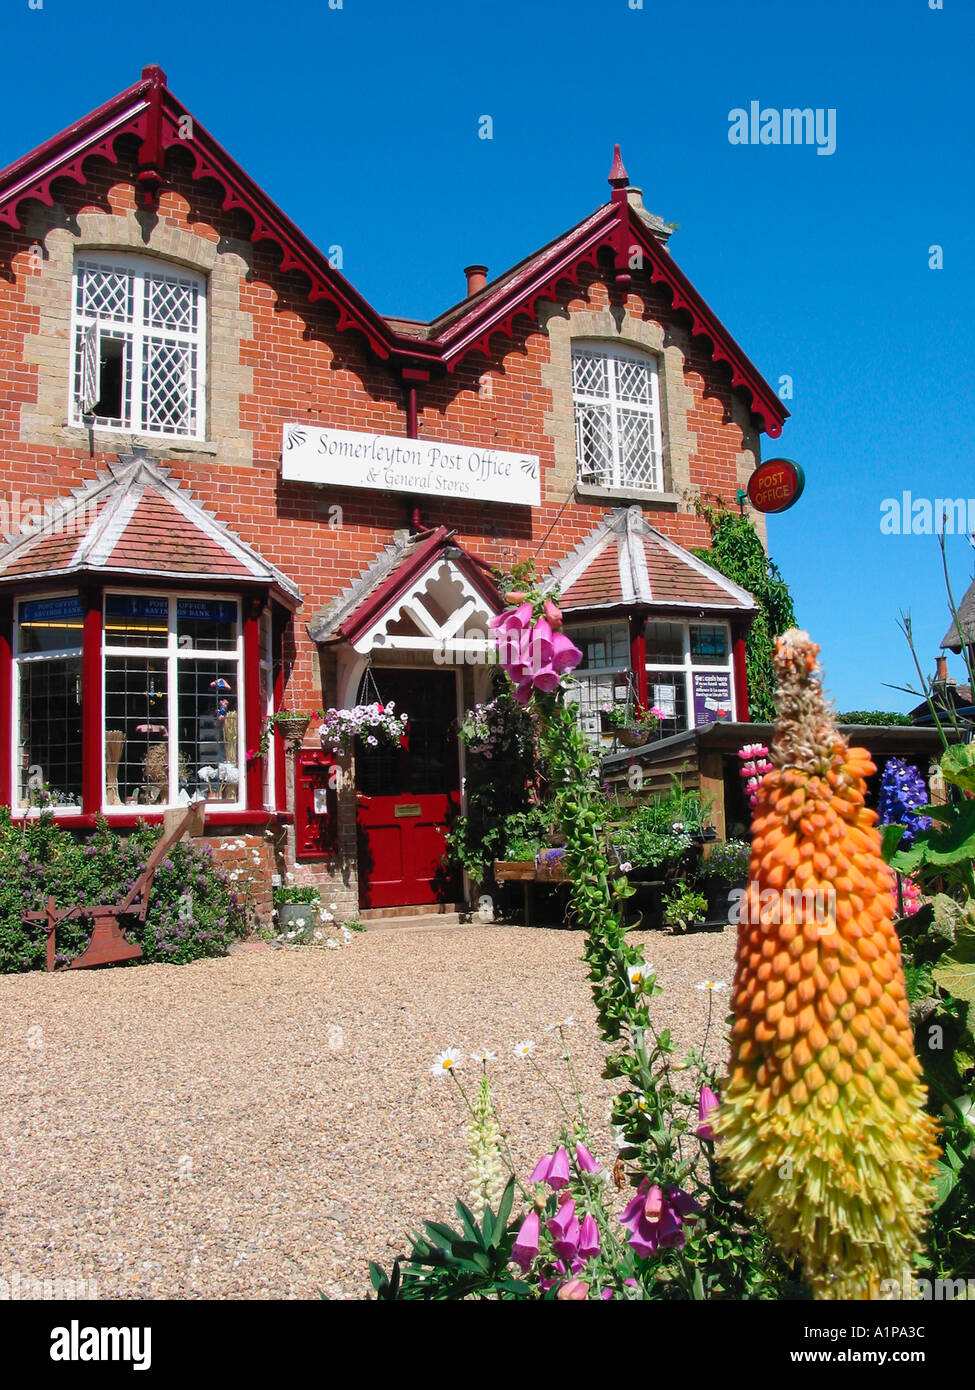 Somerleyton Village Post Office Countryside Rural Scene Stock Photo